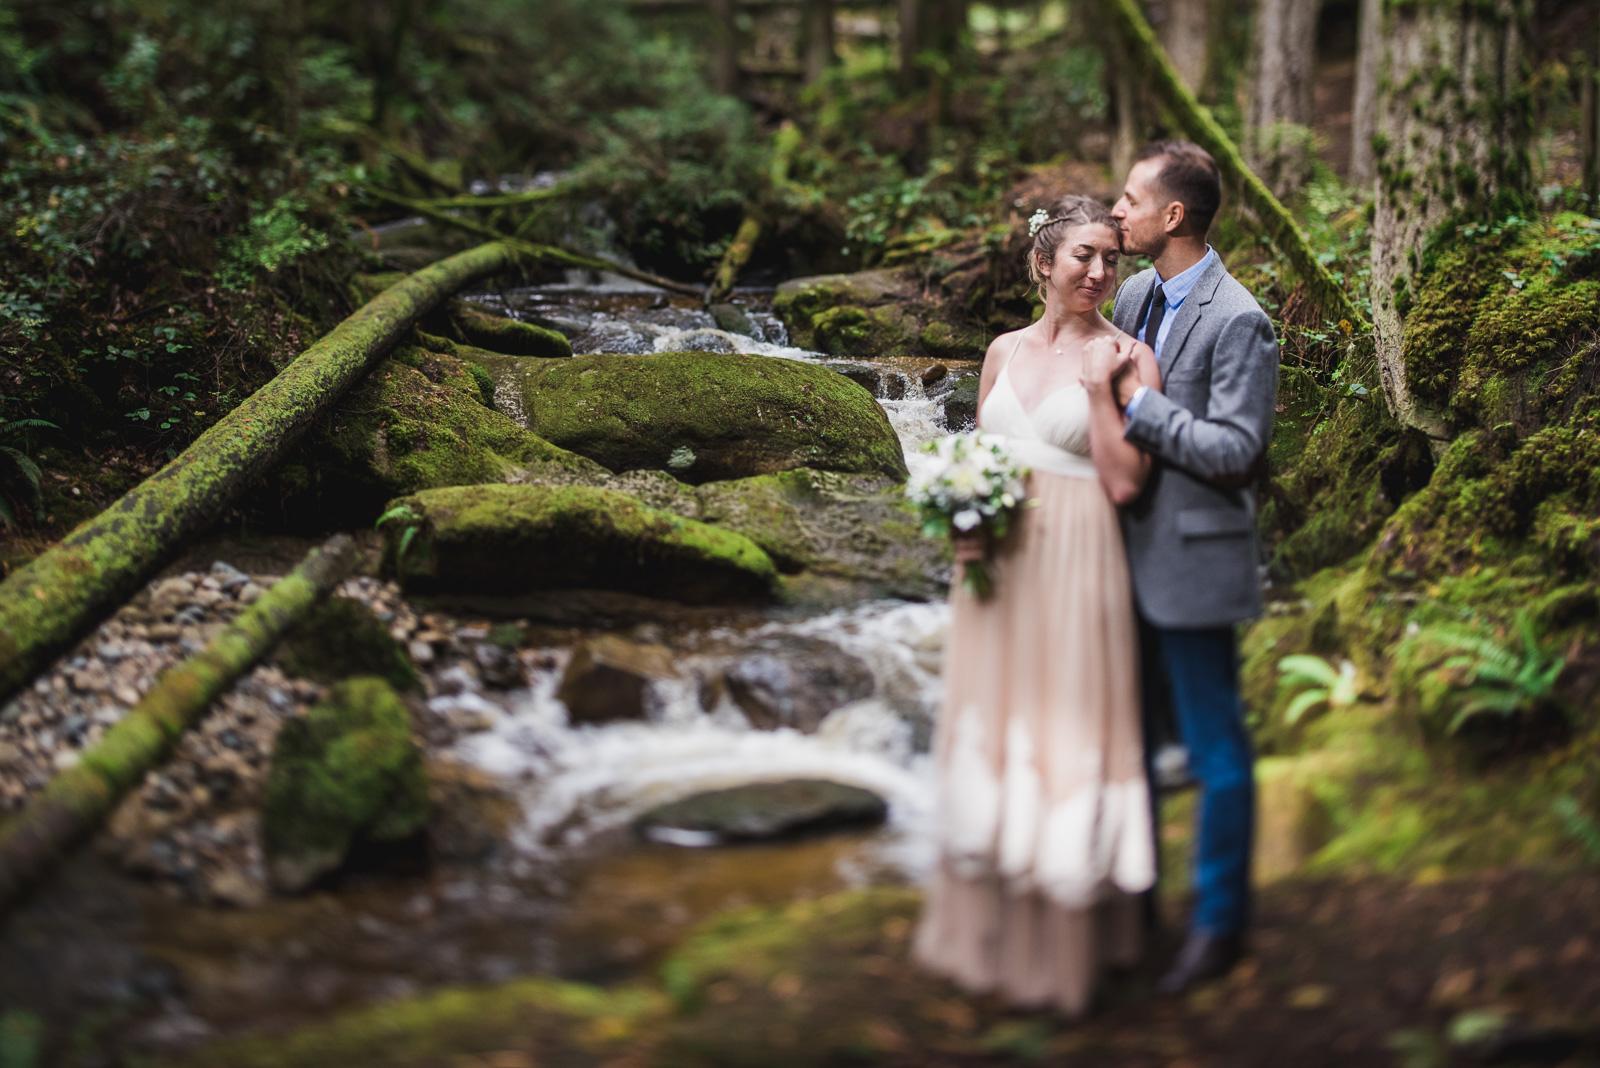 vancouver-island-wedding-photographers-cliff-gilker-park-smugglers-cove-elopement-18.jpg